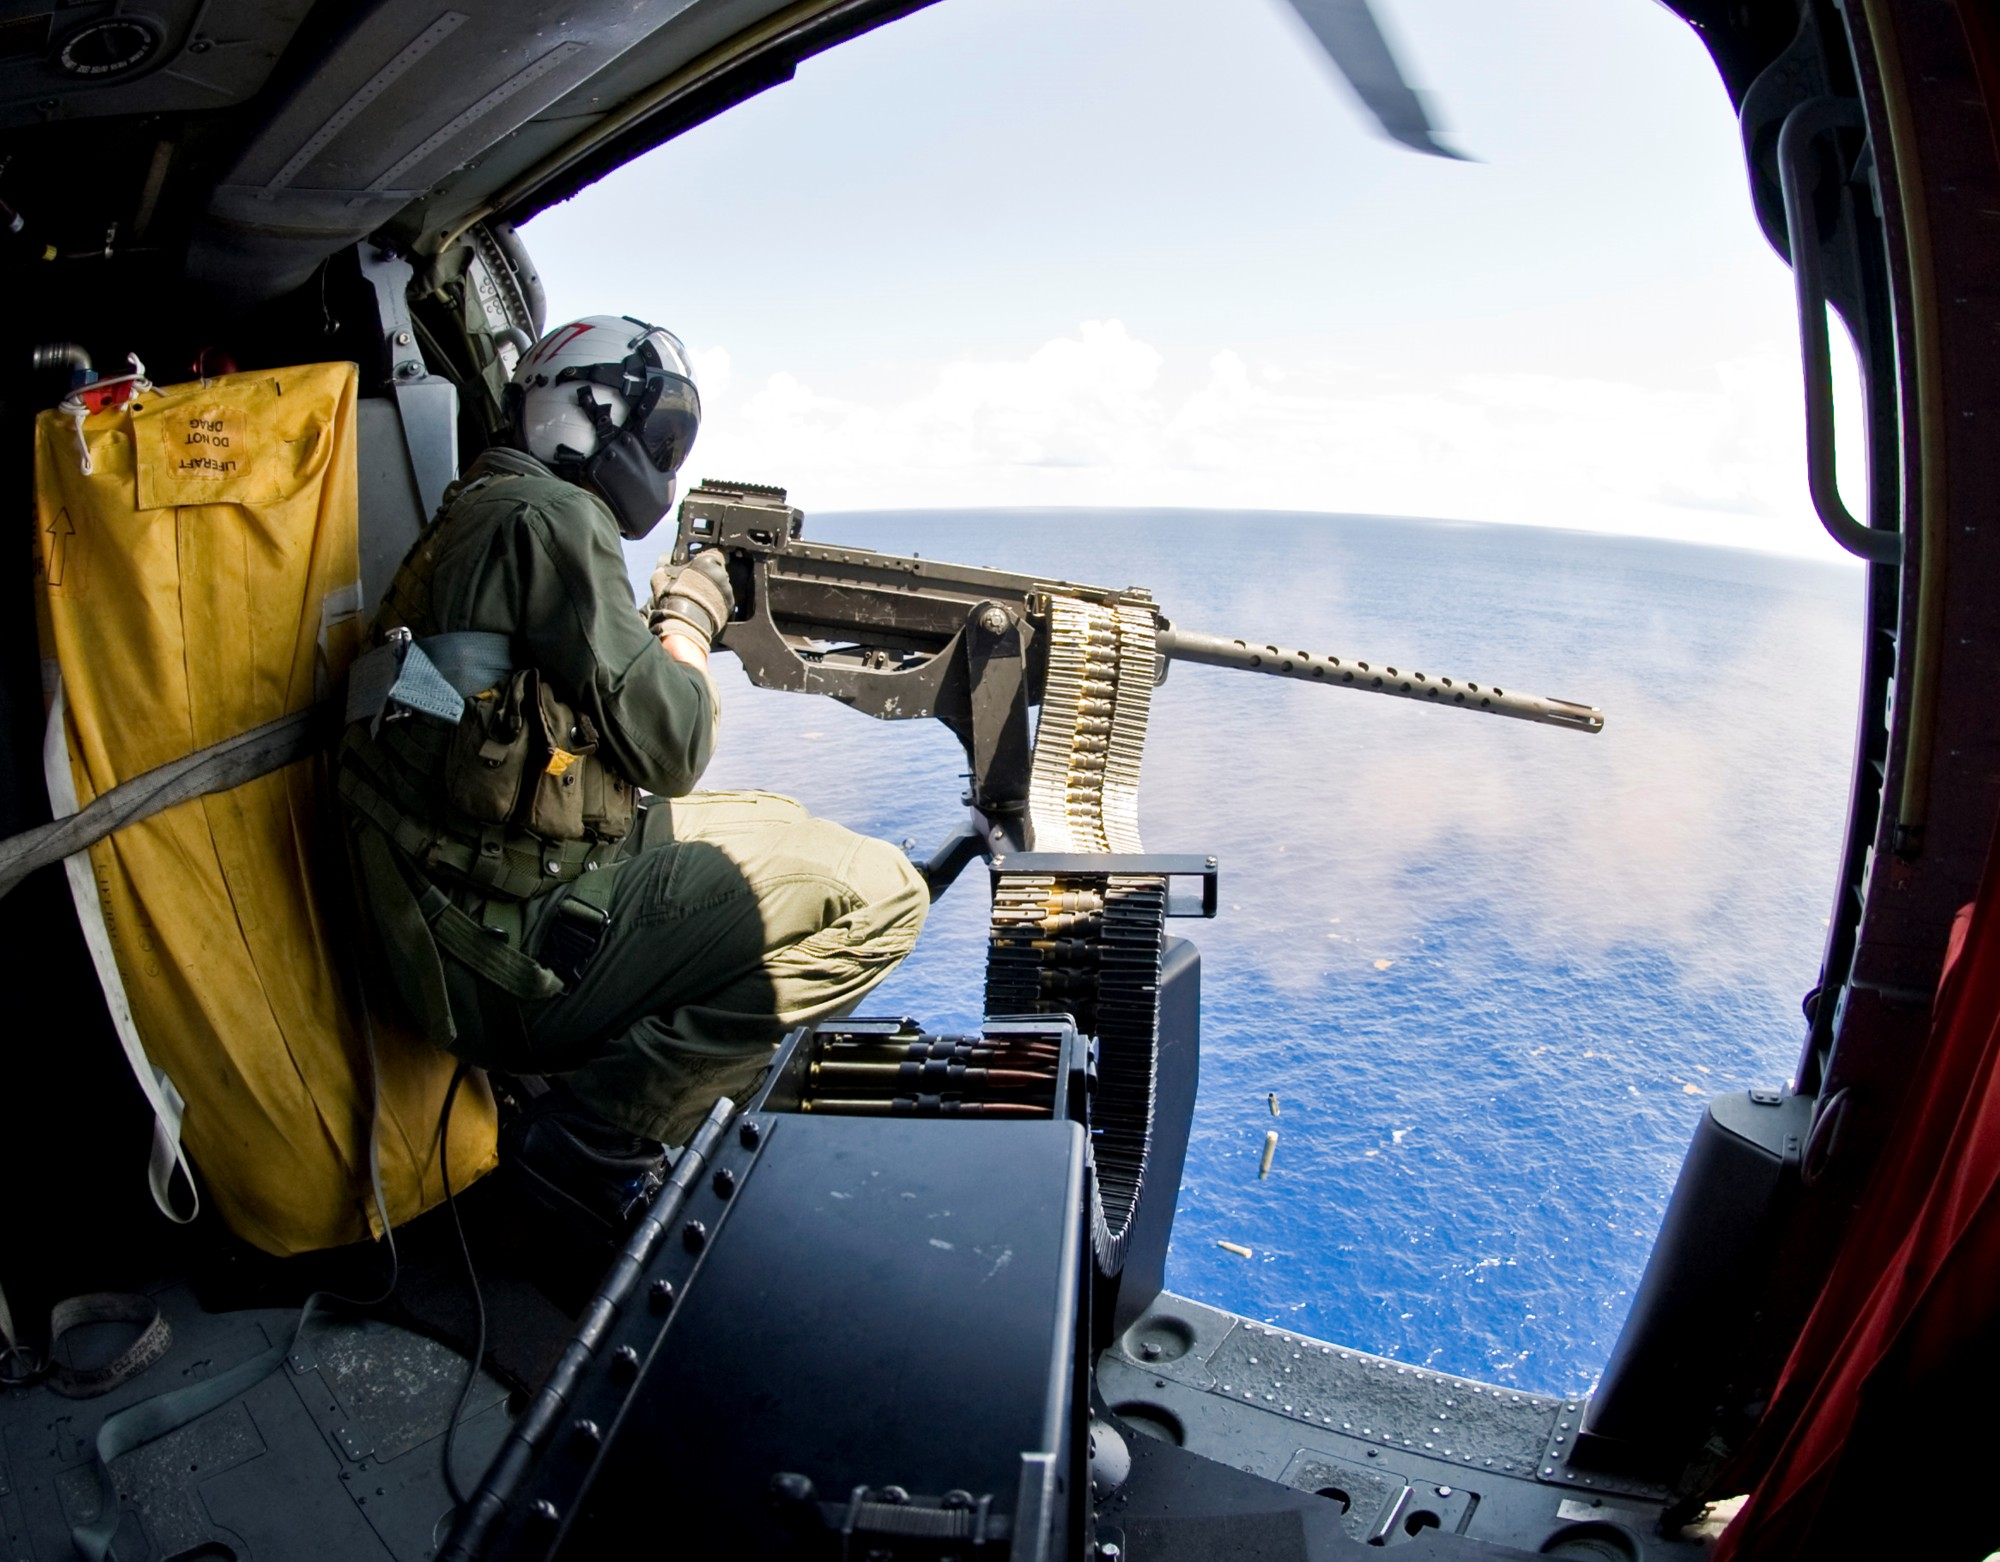 51 caliber machine gun